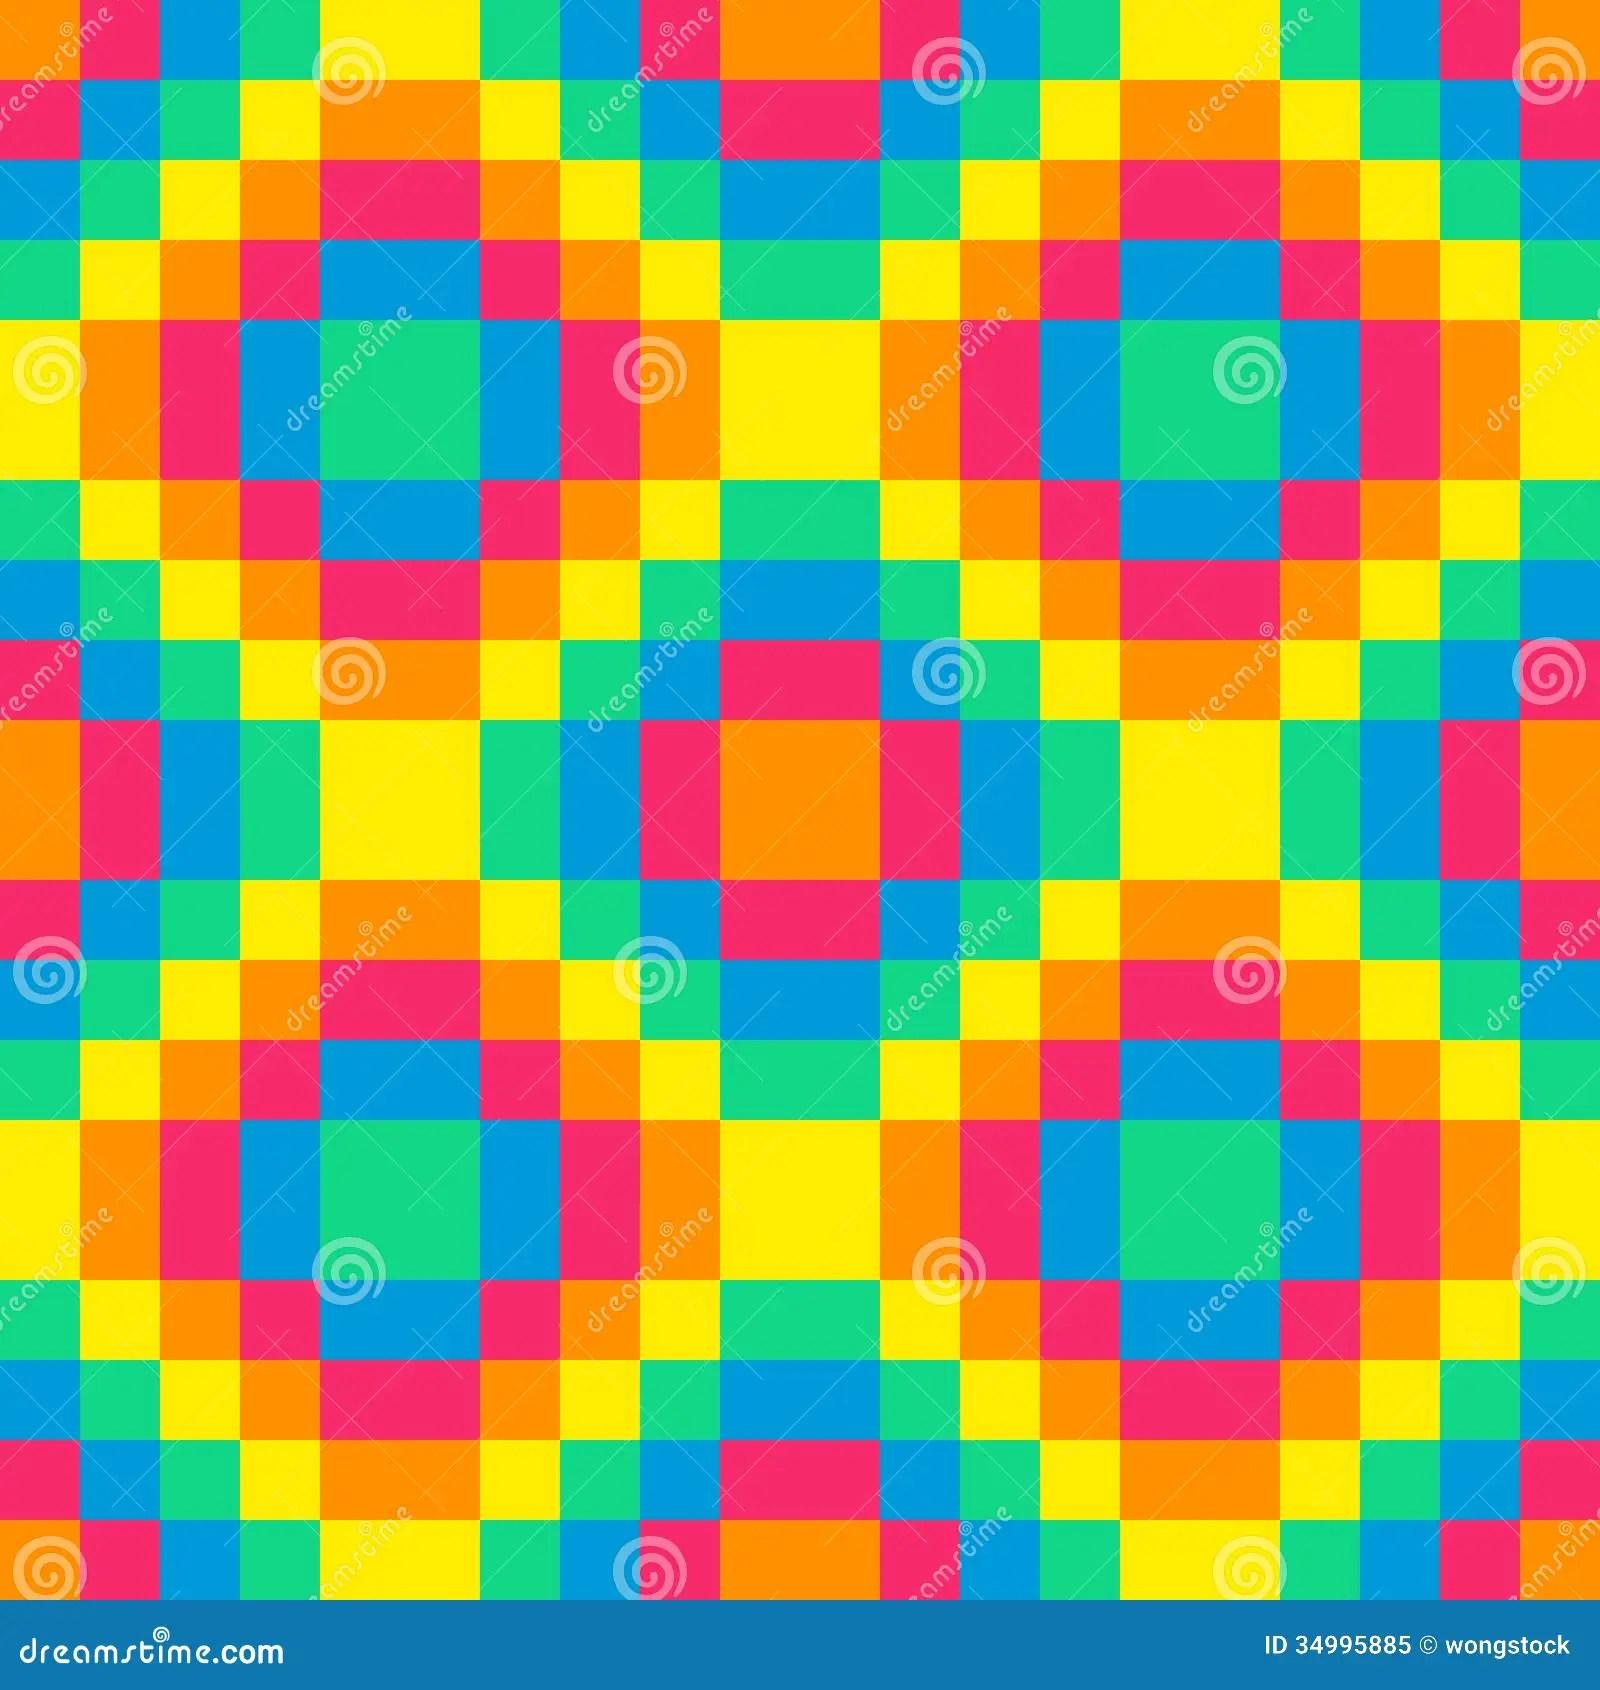 8 Bit Seamless Rainbow Diamond Pattern Background Tile Stock Image